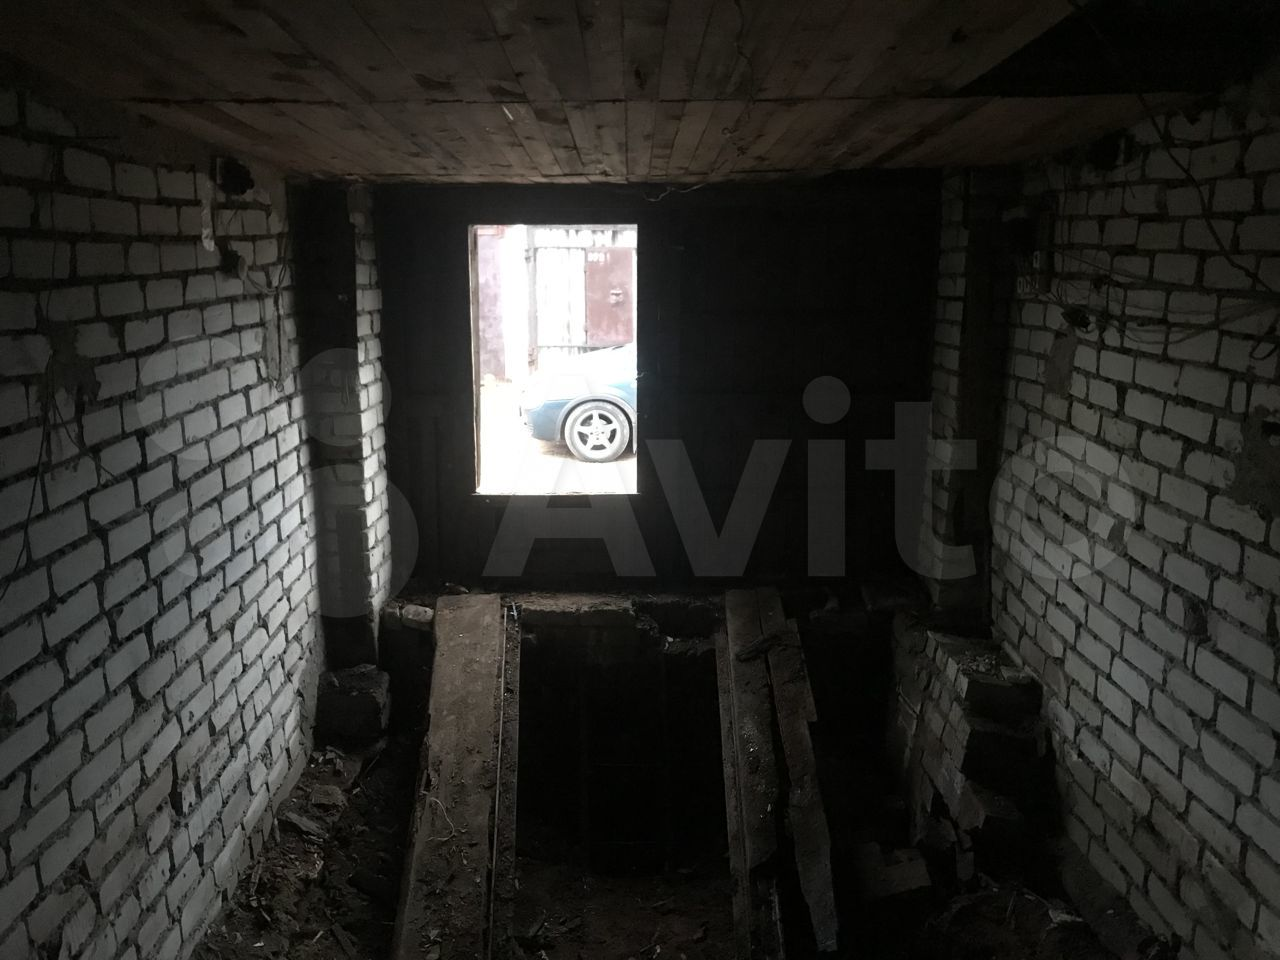 30 m2 in Kirov> Garage, > 30 m2  89253582004 buy 7